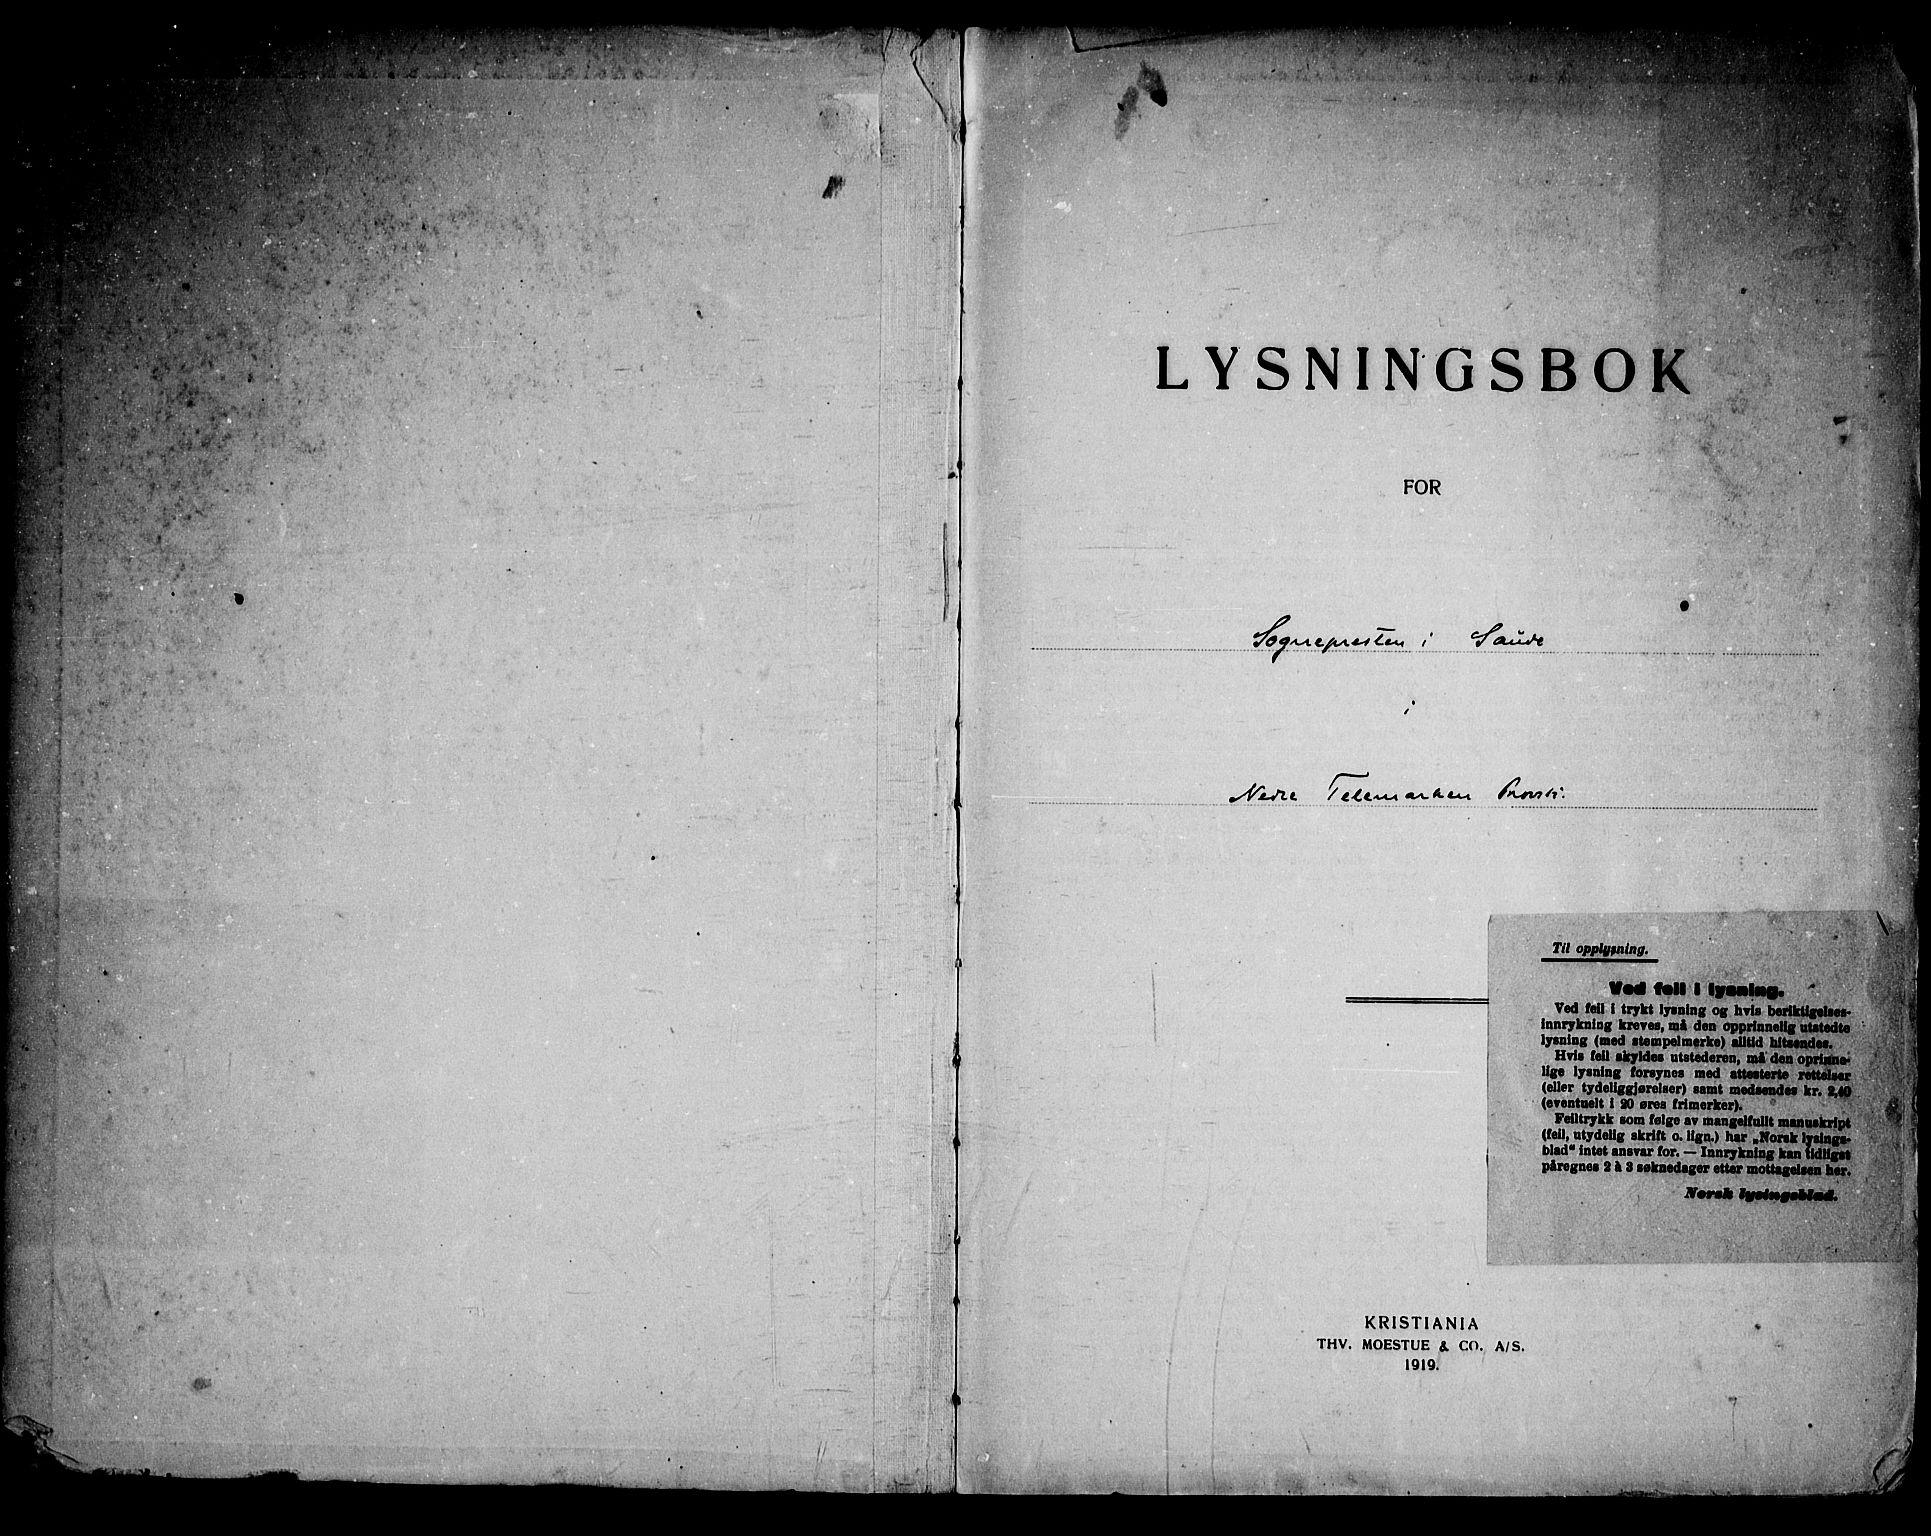 SAKO, Sauherad kirkebøker, H/Ha/L0001: Lysningsprotokoll nr. 1, 1919-1960